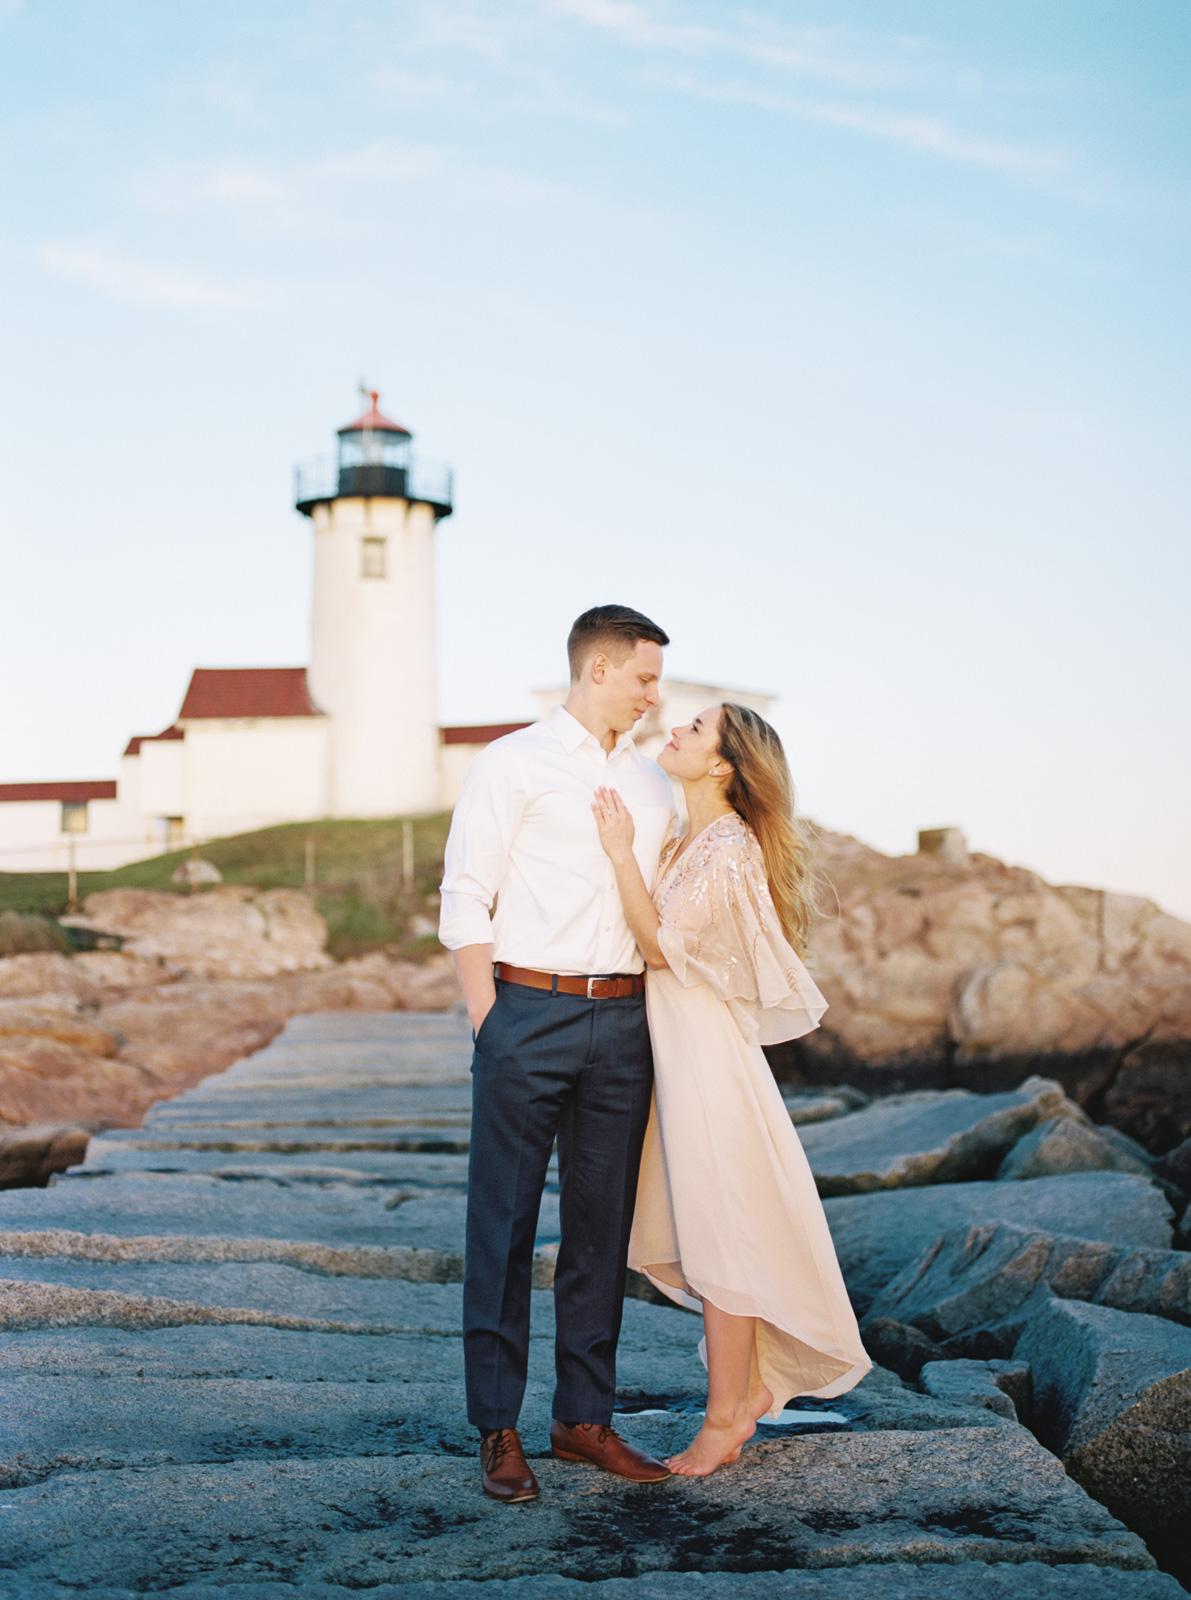 Eastern Point Lighthouse Destination Engagement Session-56.jpg